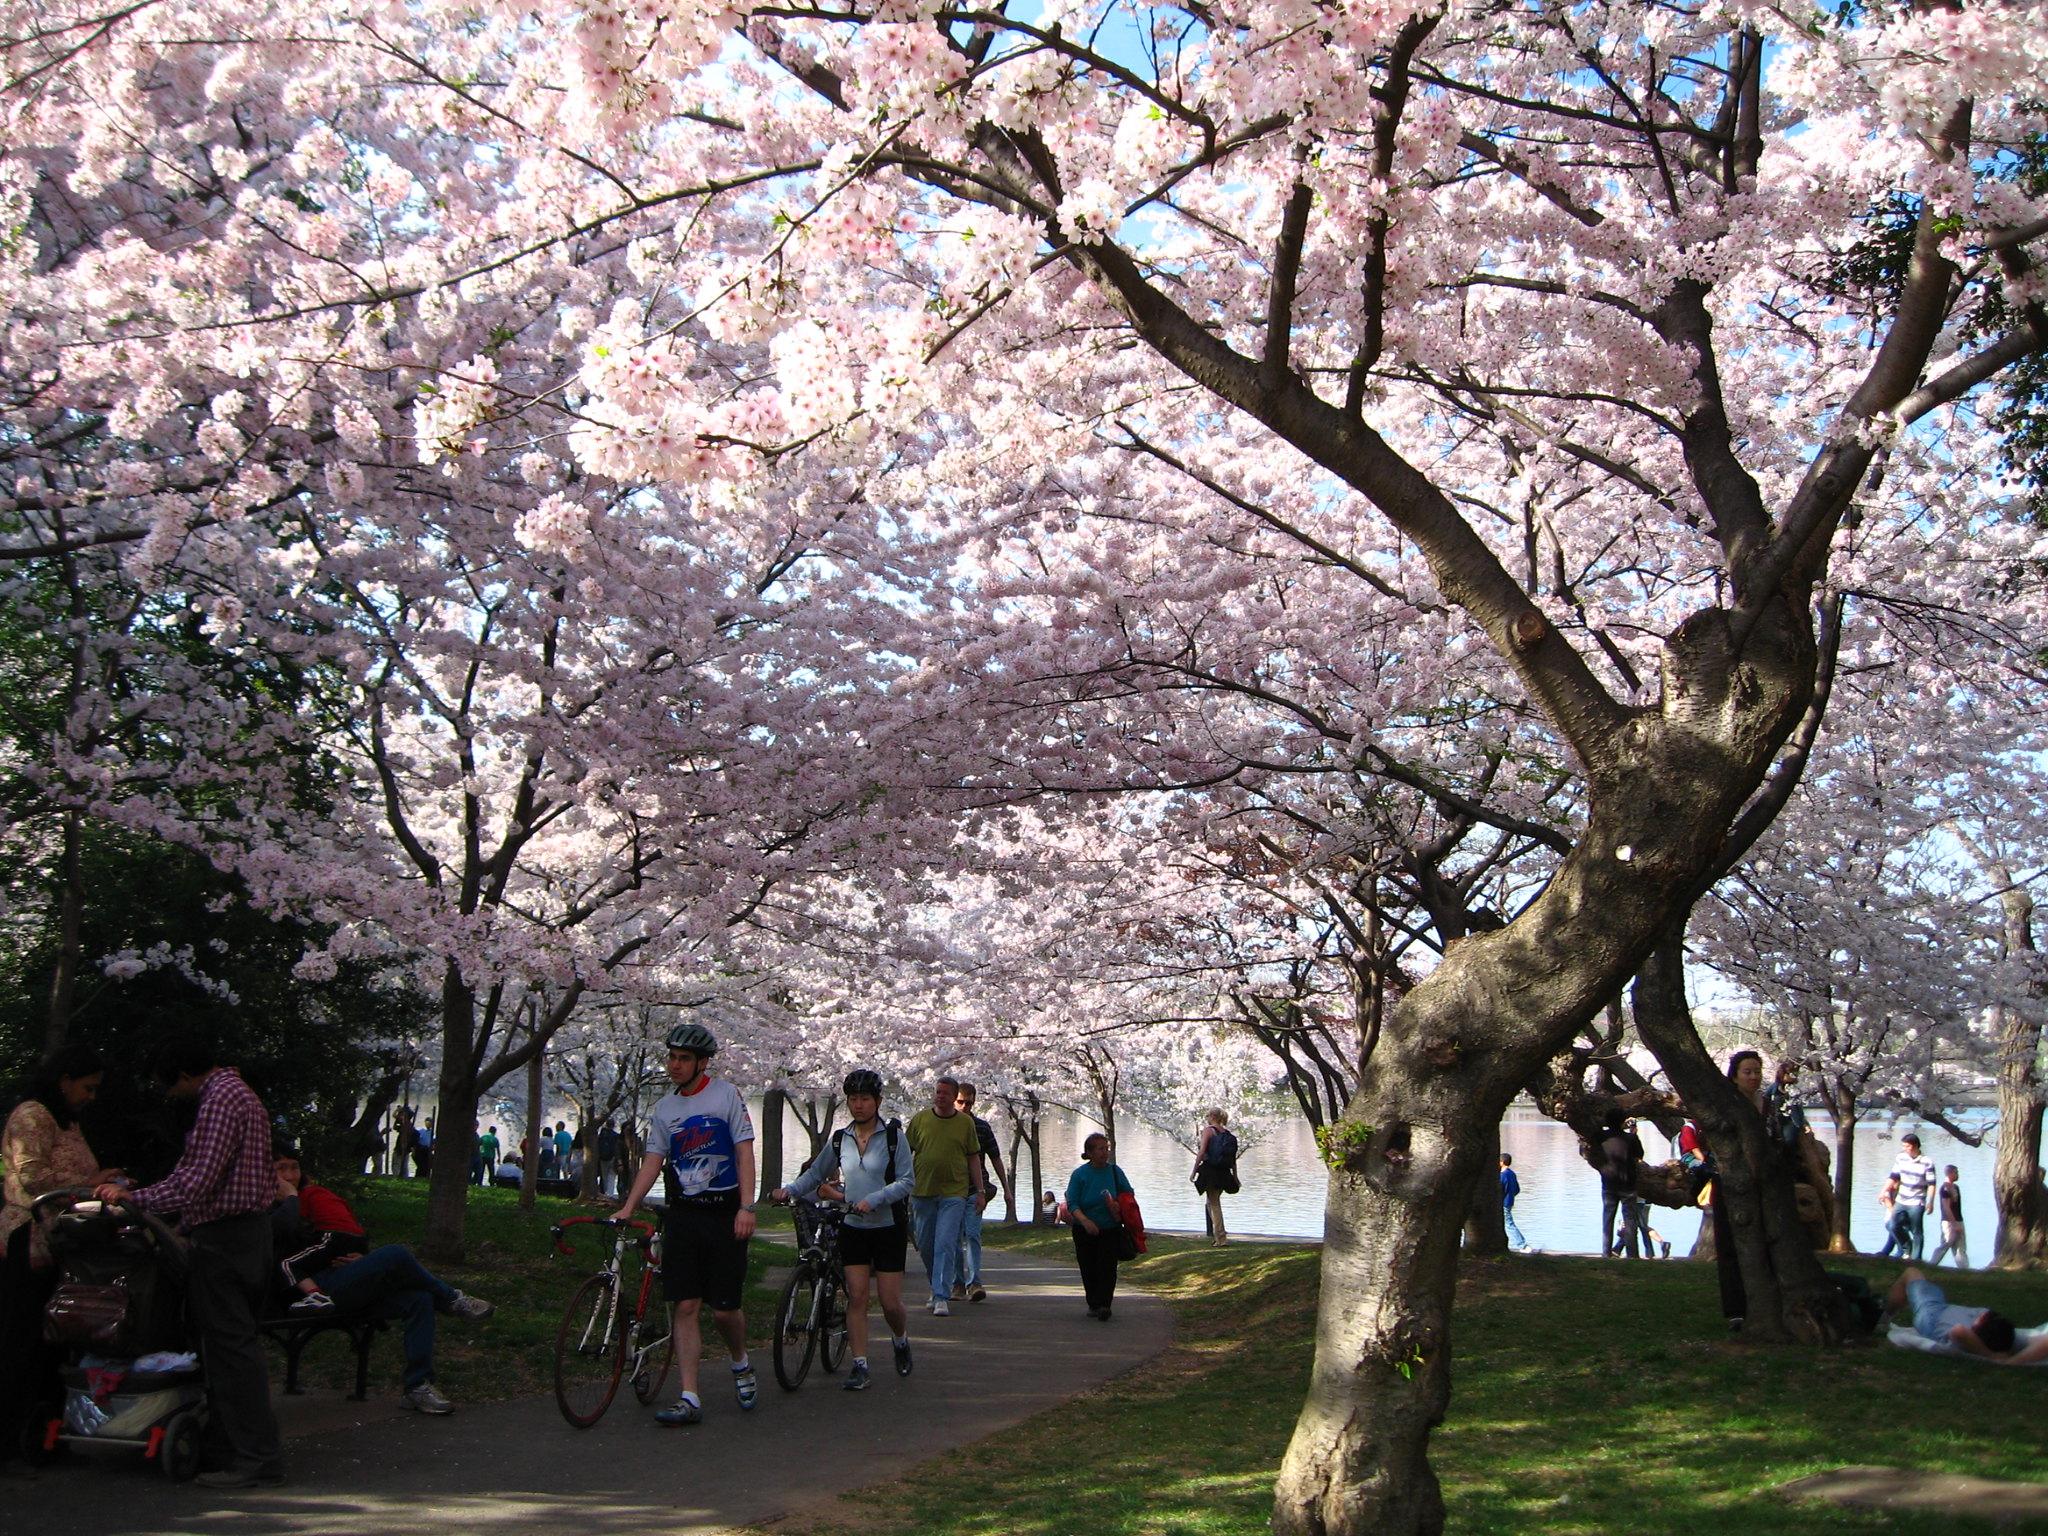 Enjoy The International Cherry Blossom Festival In Georgia This Spring